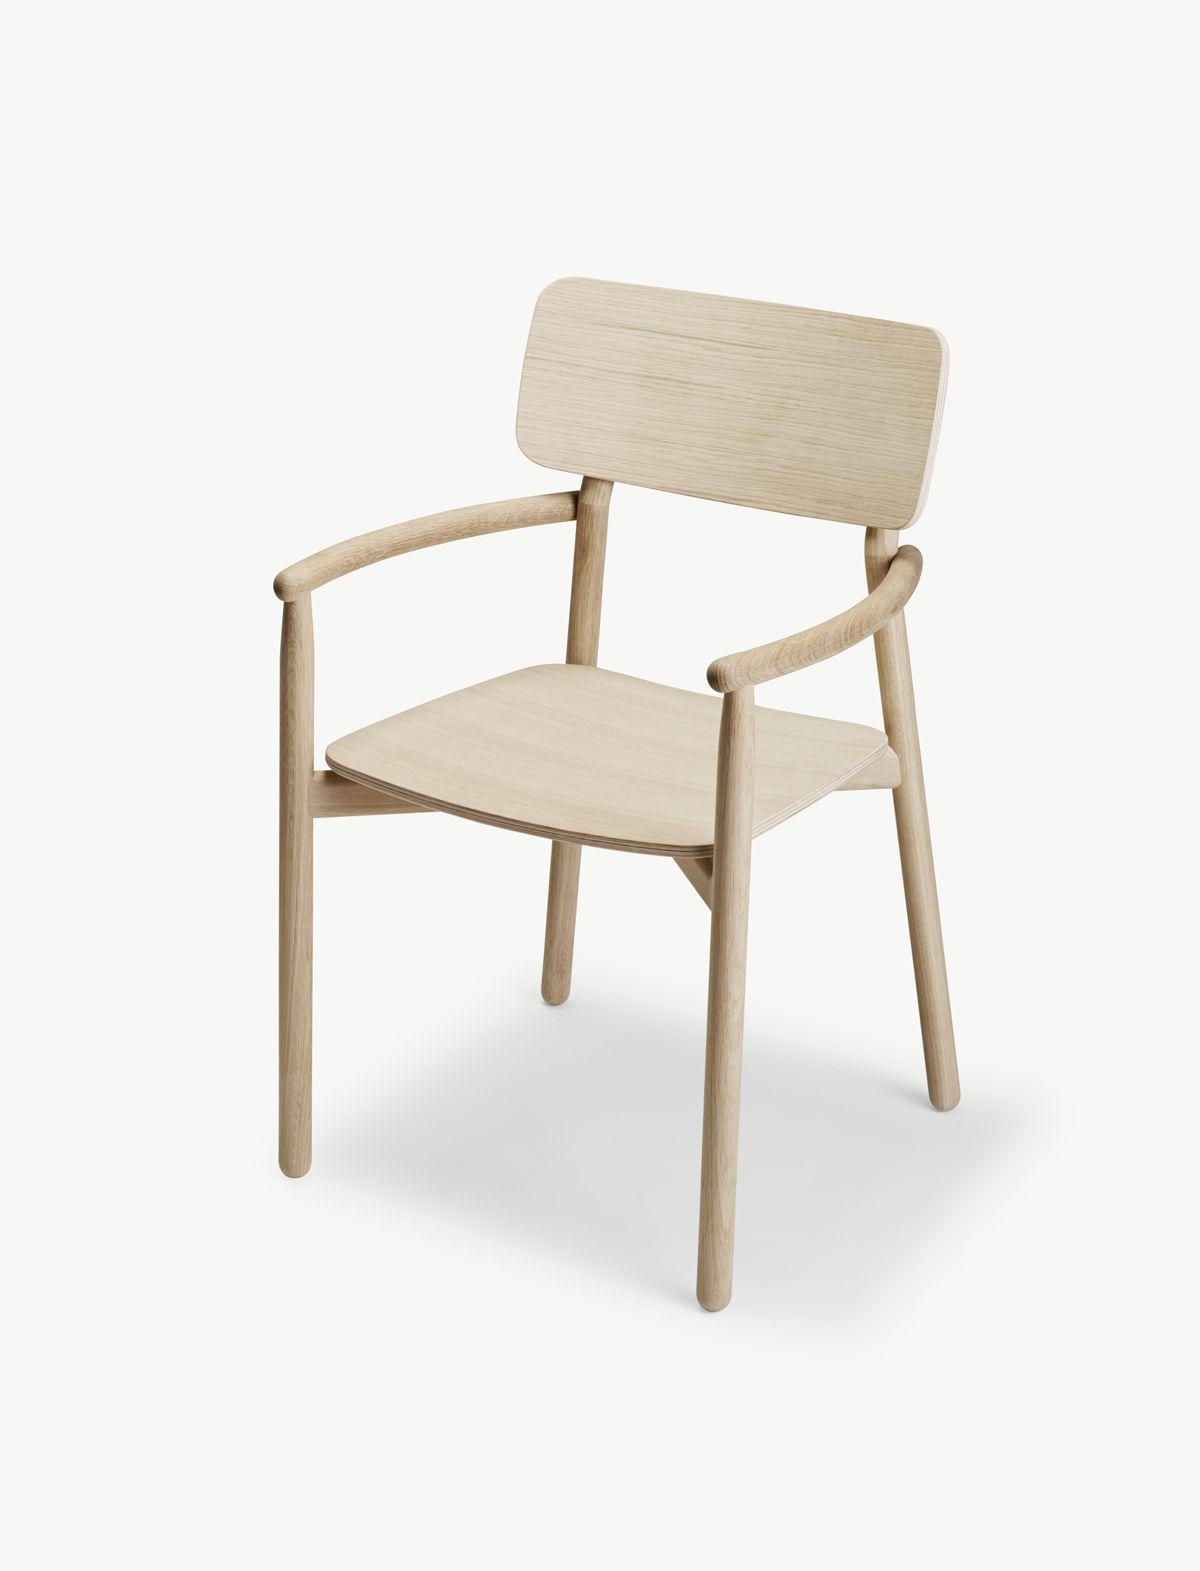 Stuhl hven mit armlehne von skagerak i holzdesignpur for Stuhl armlehne